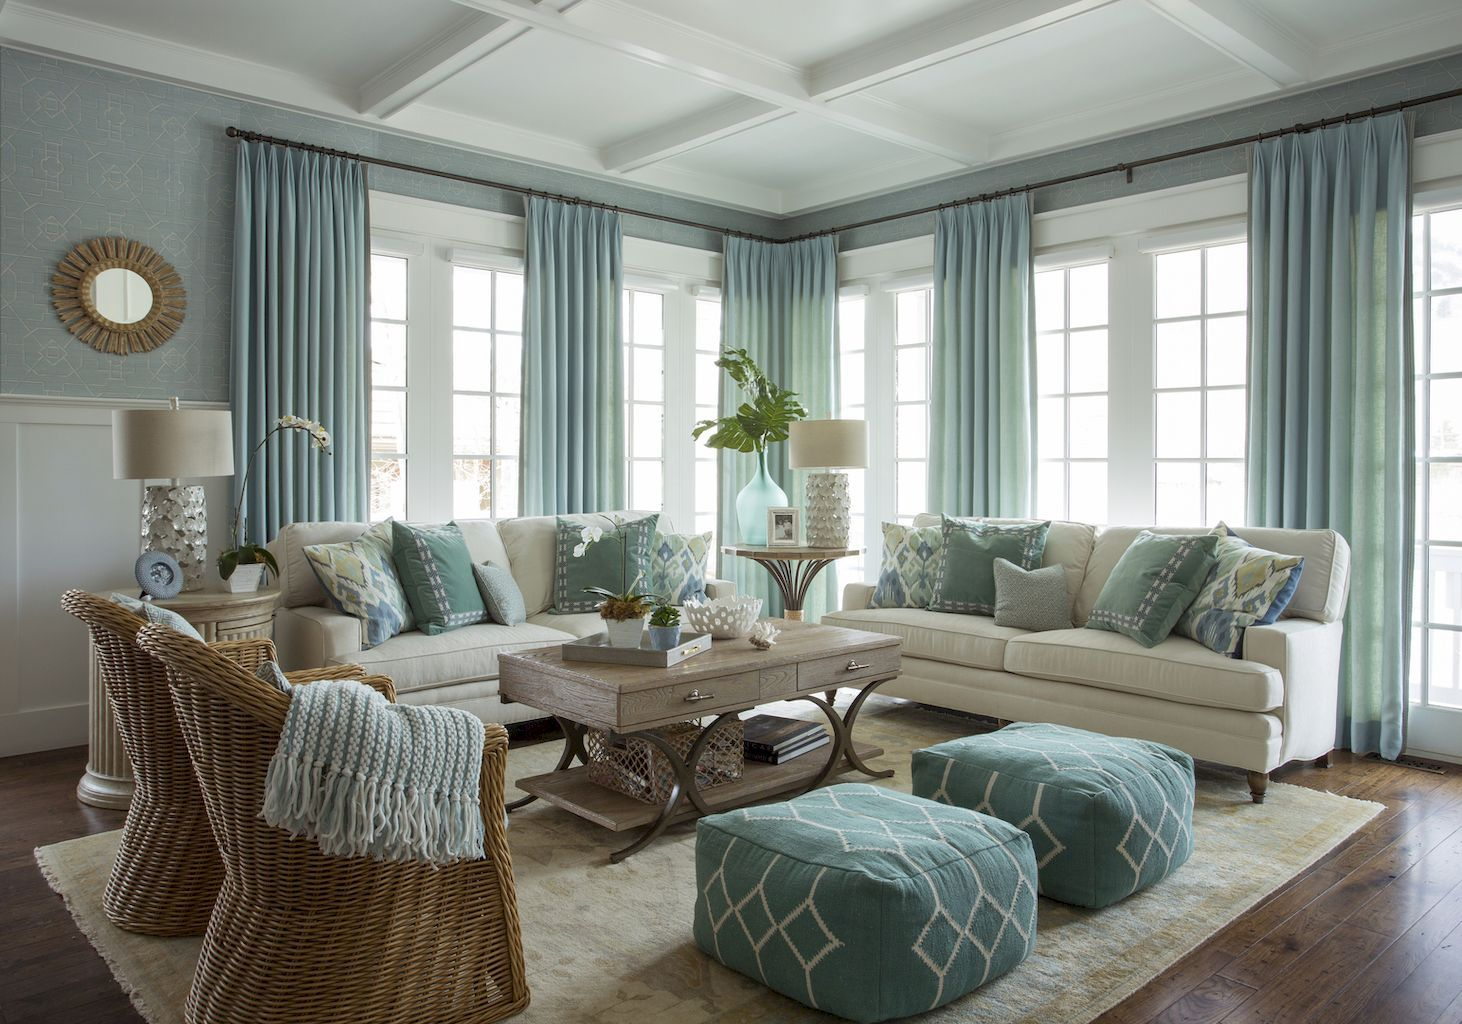 60+ Vintage Living Room Ideas Decoration | Pinterest | Living room ...